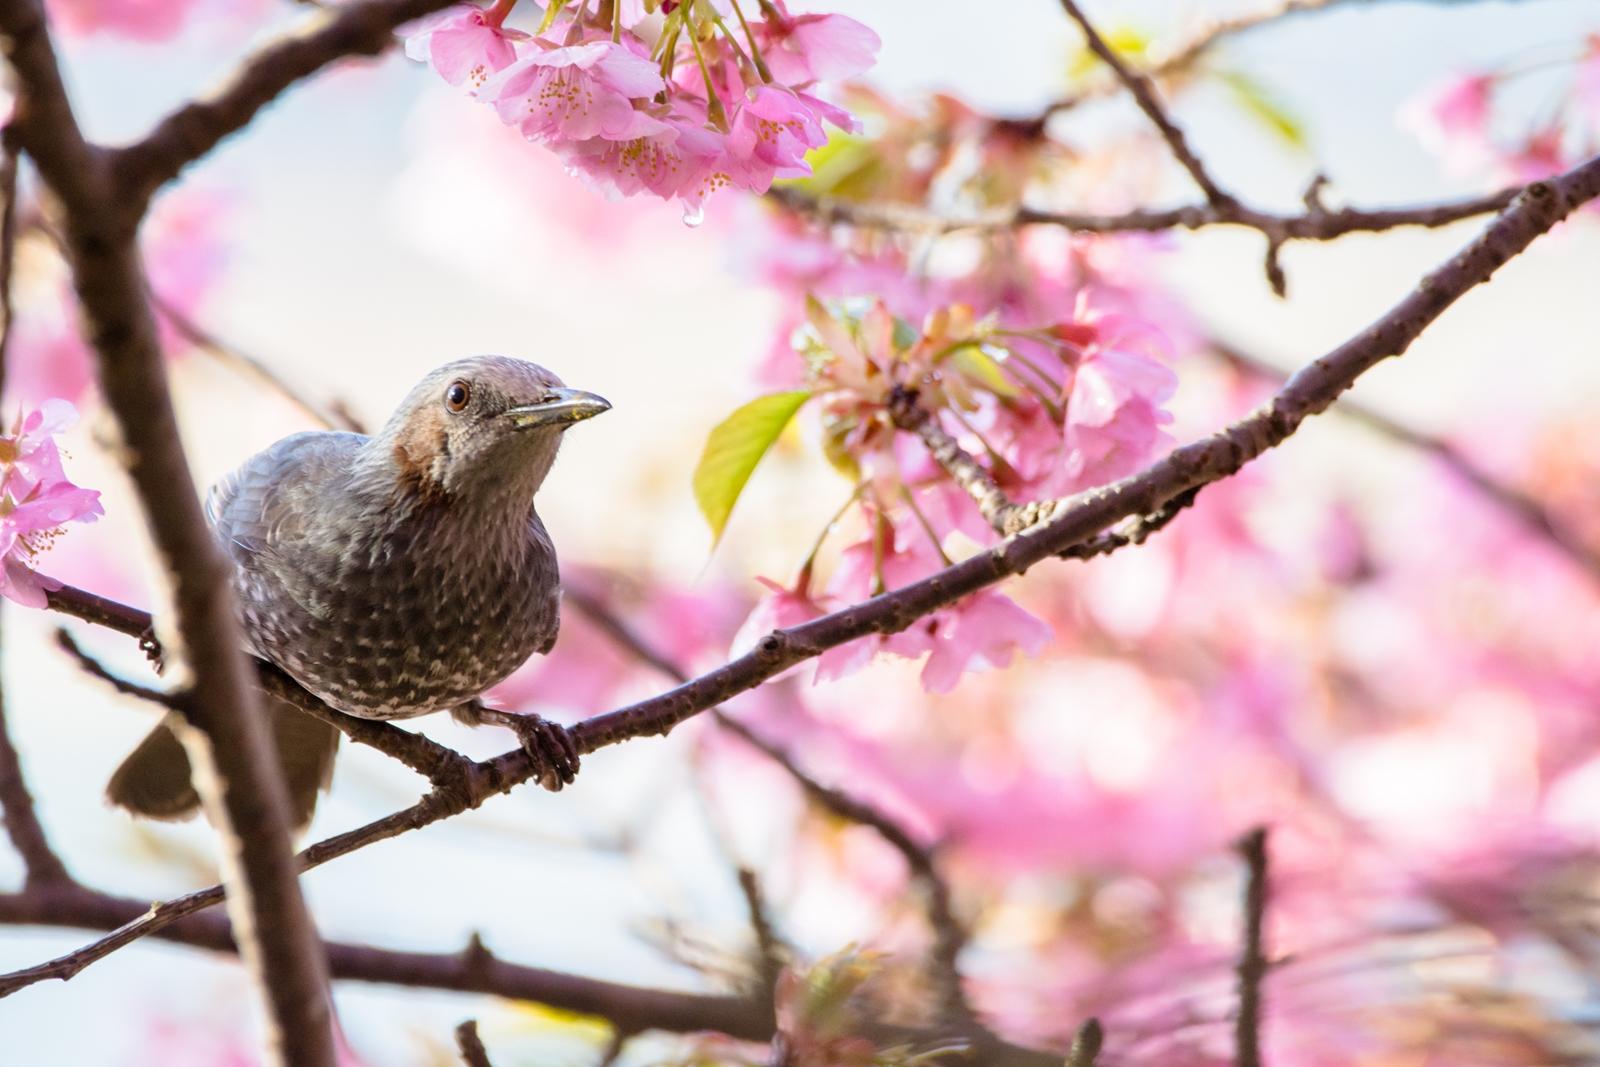 Photo: 「目を輝かせて」 / Shining eyes.  目をキラキラと 体も前へ前へ 我慢なんてできないね 一緒に春を楽しもう  Brown-eared Bulbul. (ヒヨドリ)  Nikon D7200 SIGMA 150-600mm F5-6.3 DG OS HSM Contemporary  #birdphotography #birds #kawaii #nikon #sigma #小鳥グラファー  ( http://takafumiooshio.com/archives/952 )